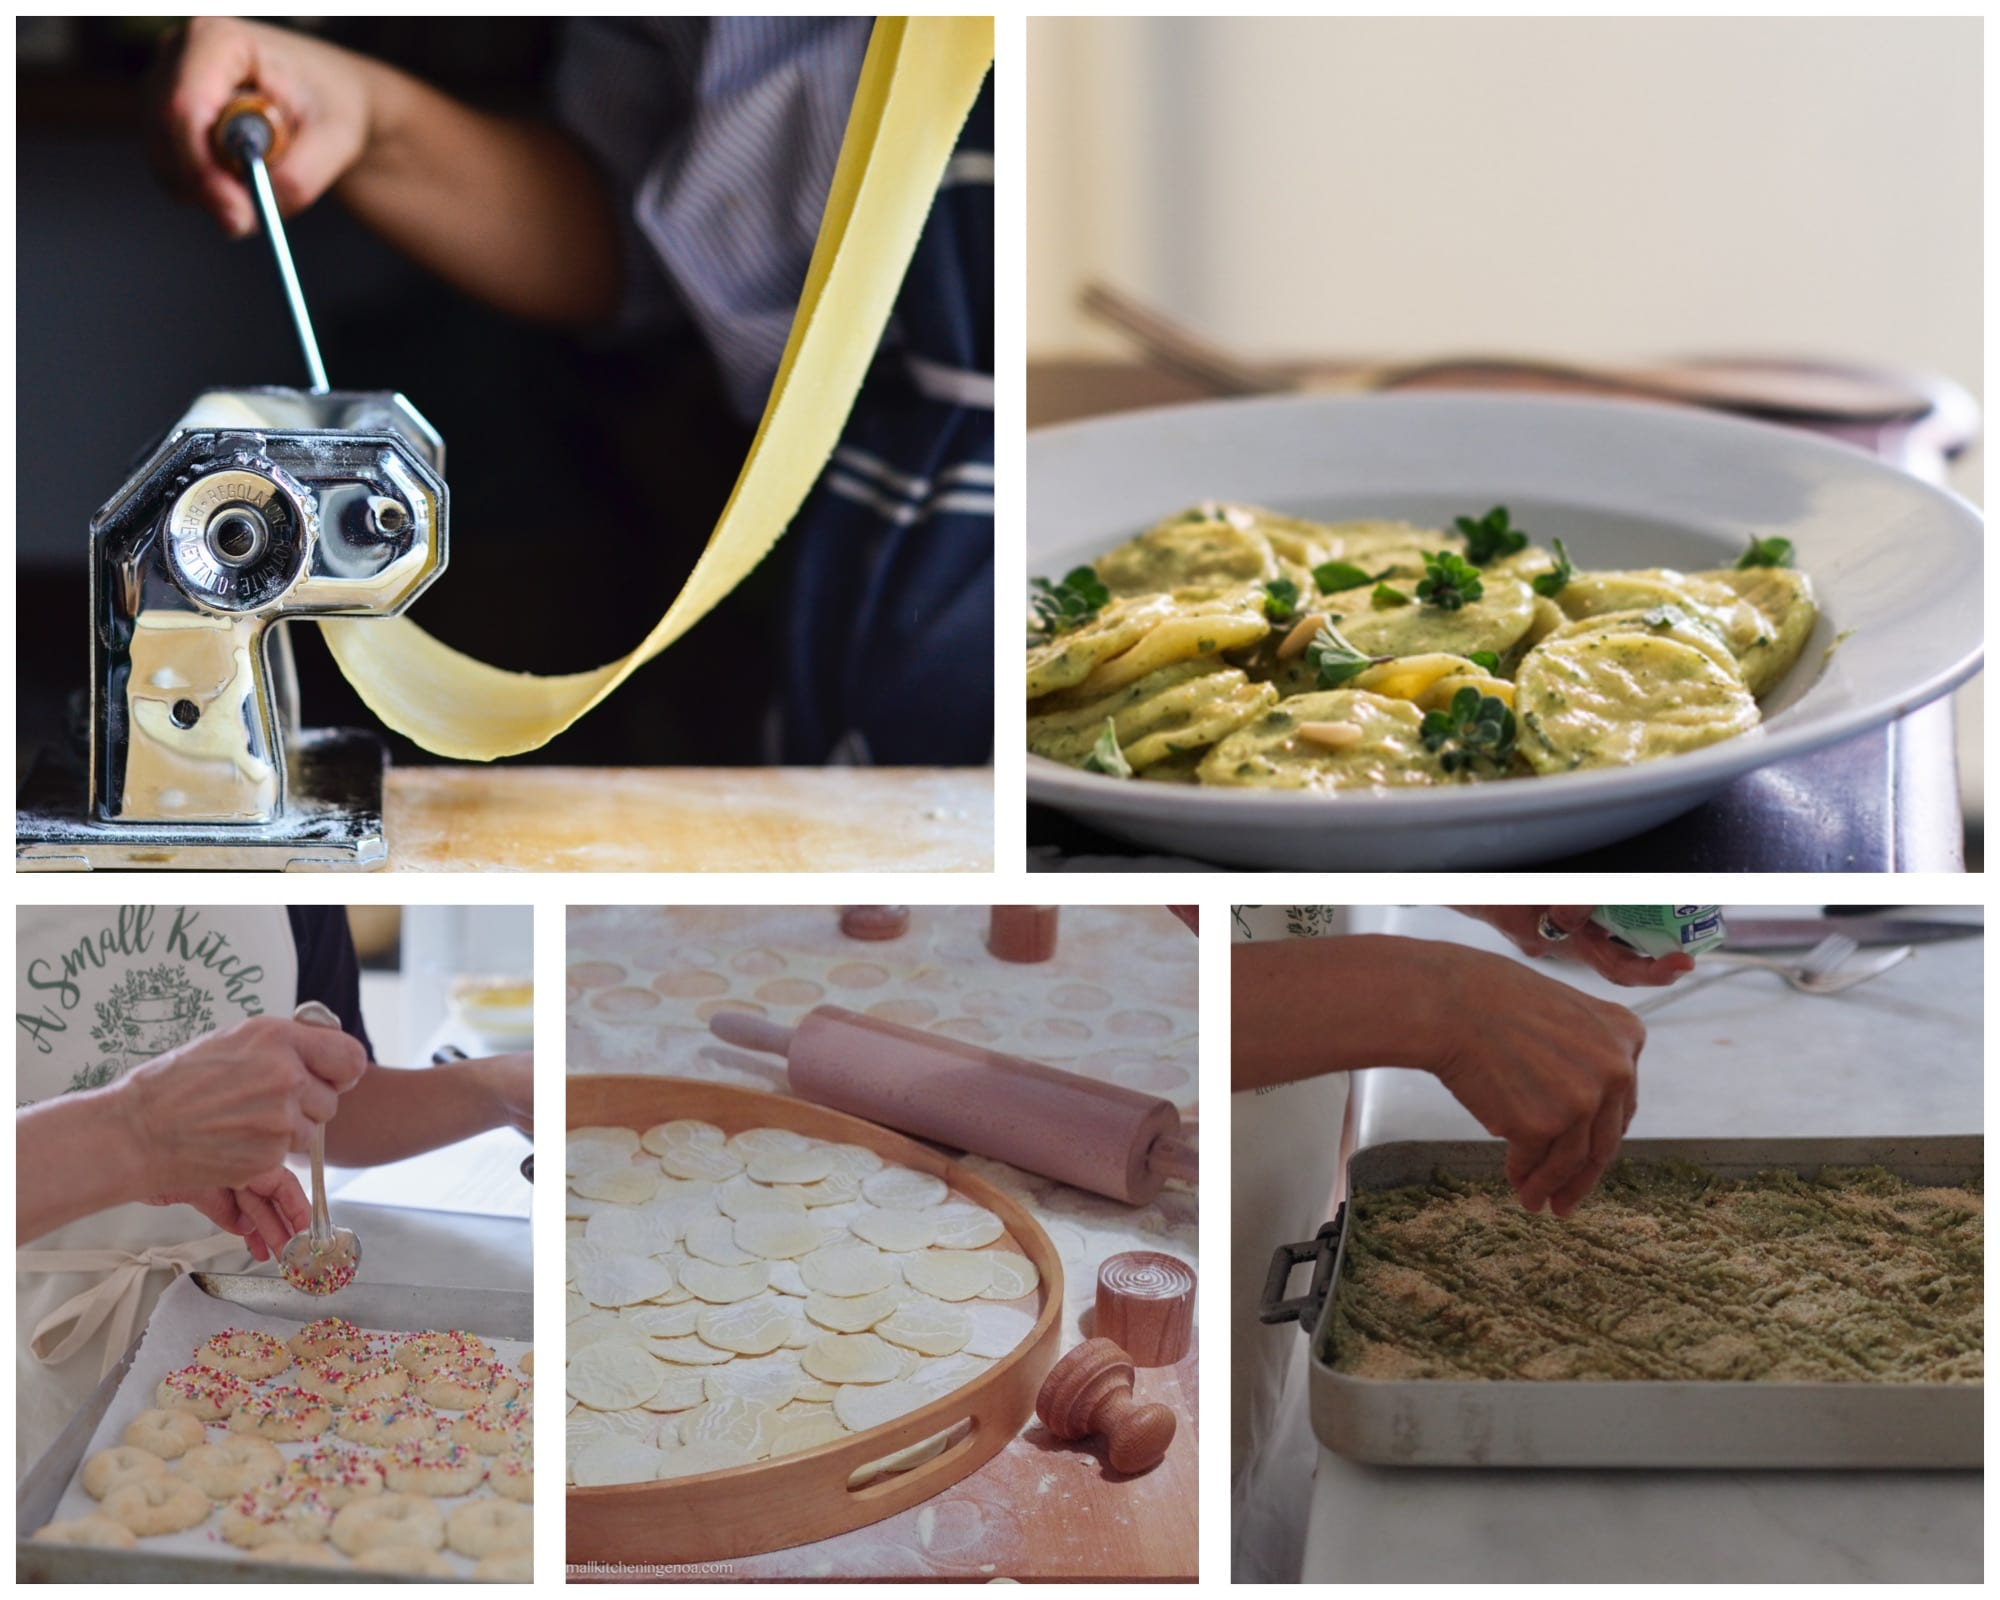 Corsi di cucina ligure asmallkitcheningenoa - Corsi di cucina genova ...